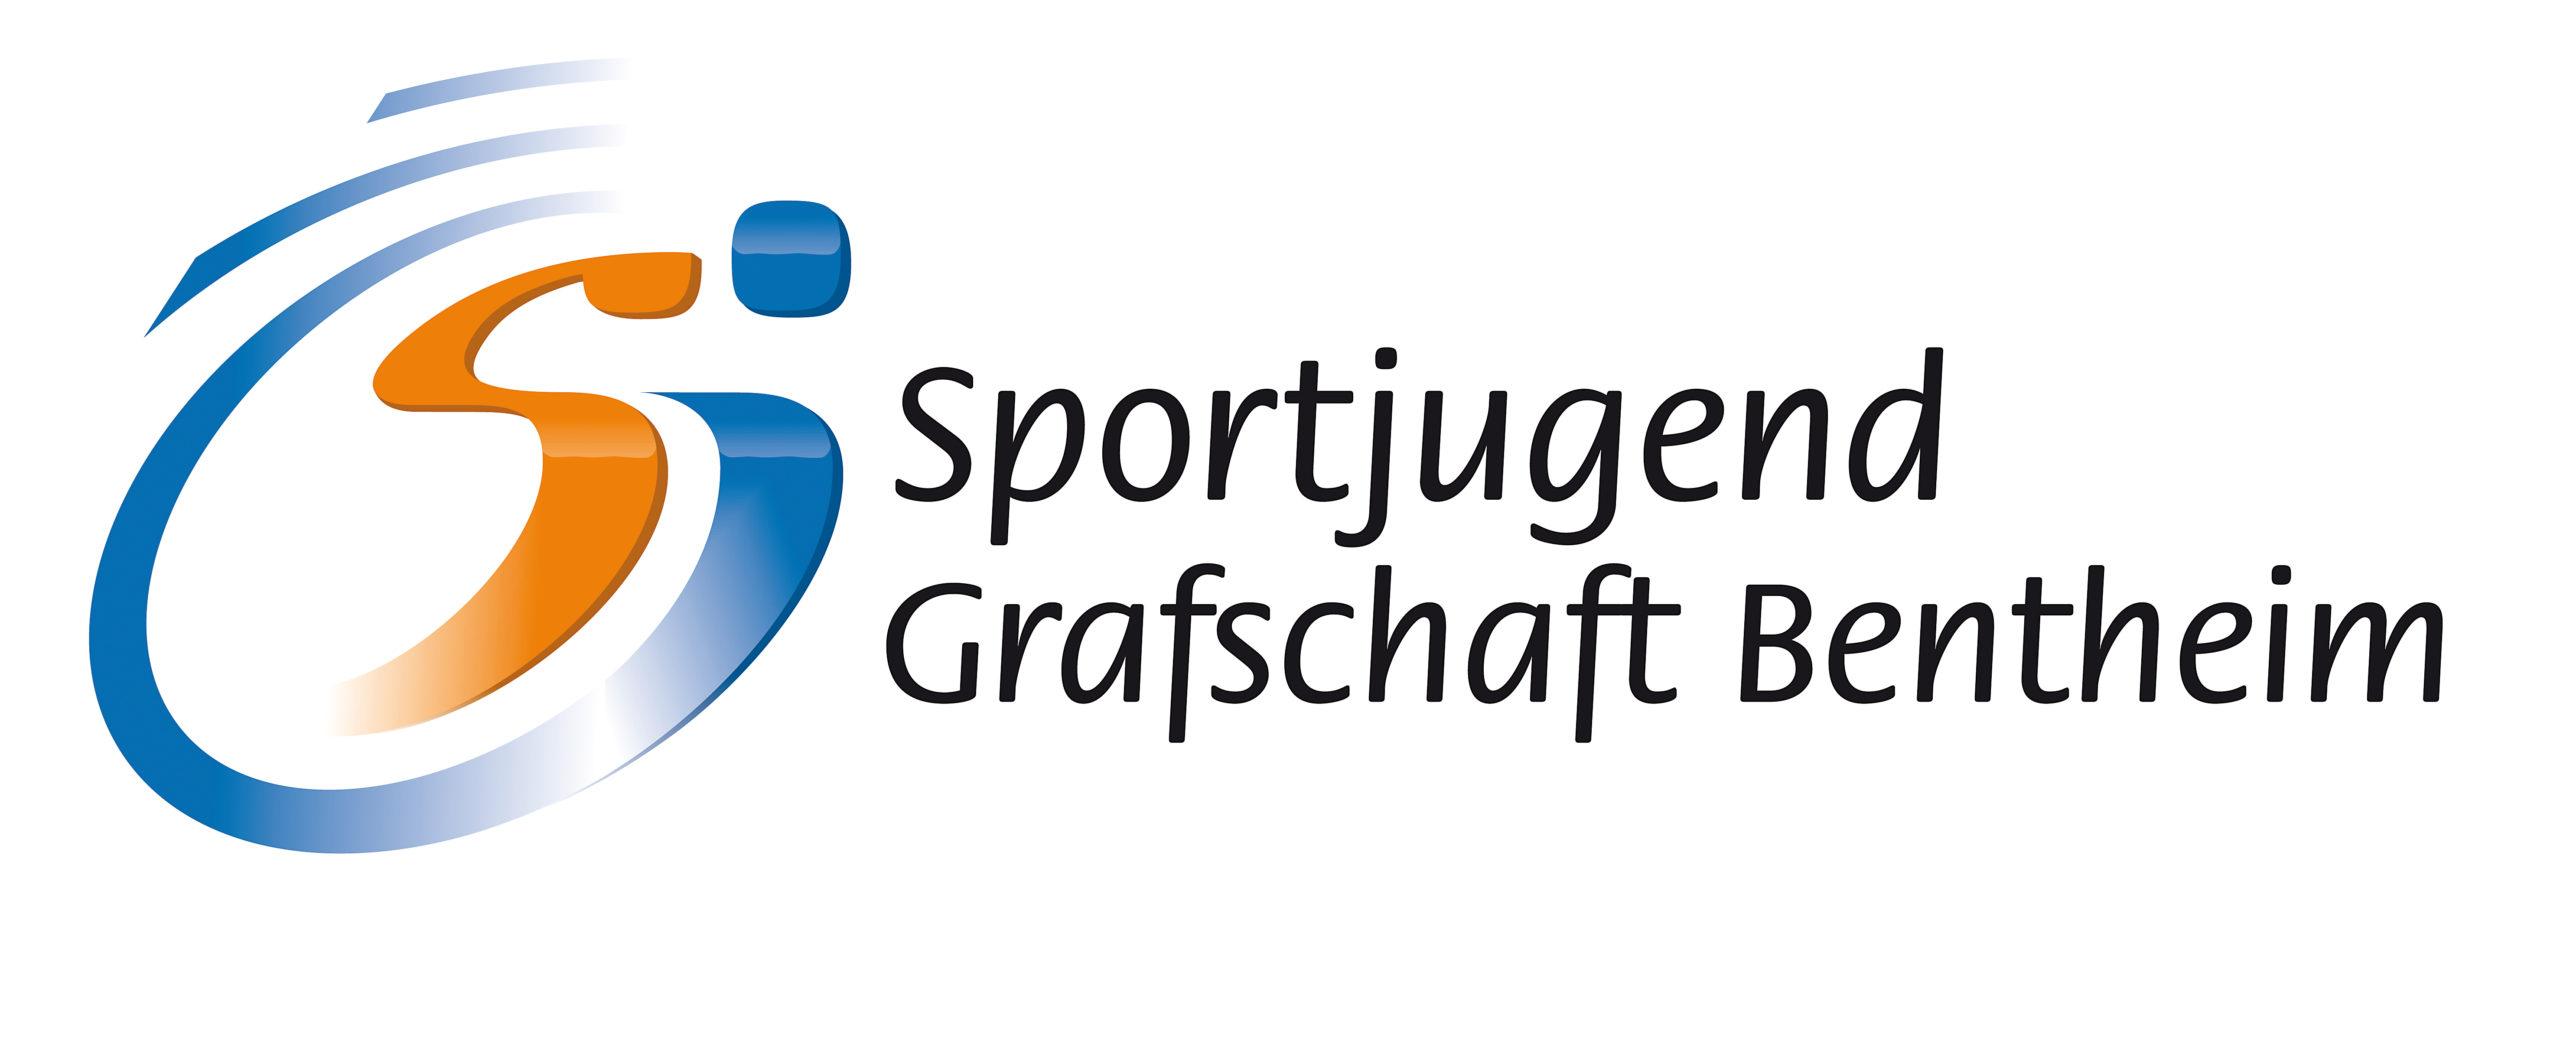 Sportjugend Niedersachsen  Langeoog  sj Logo